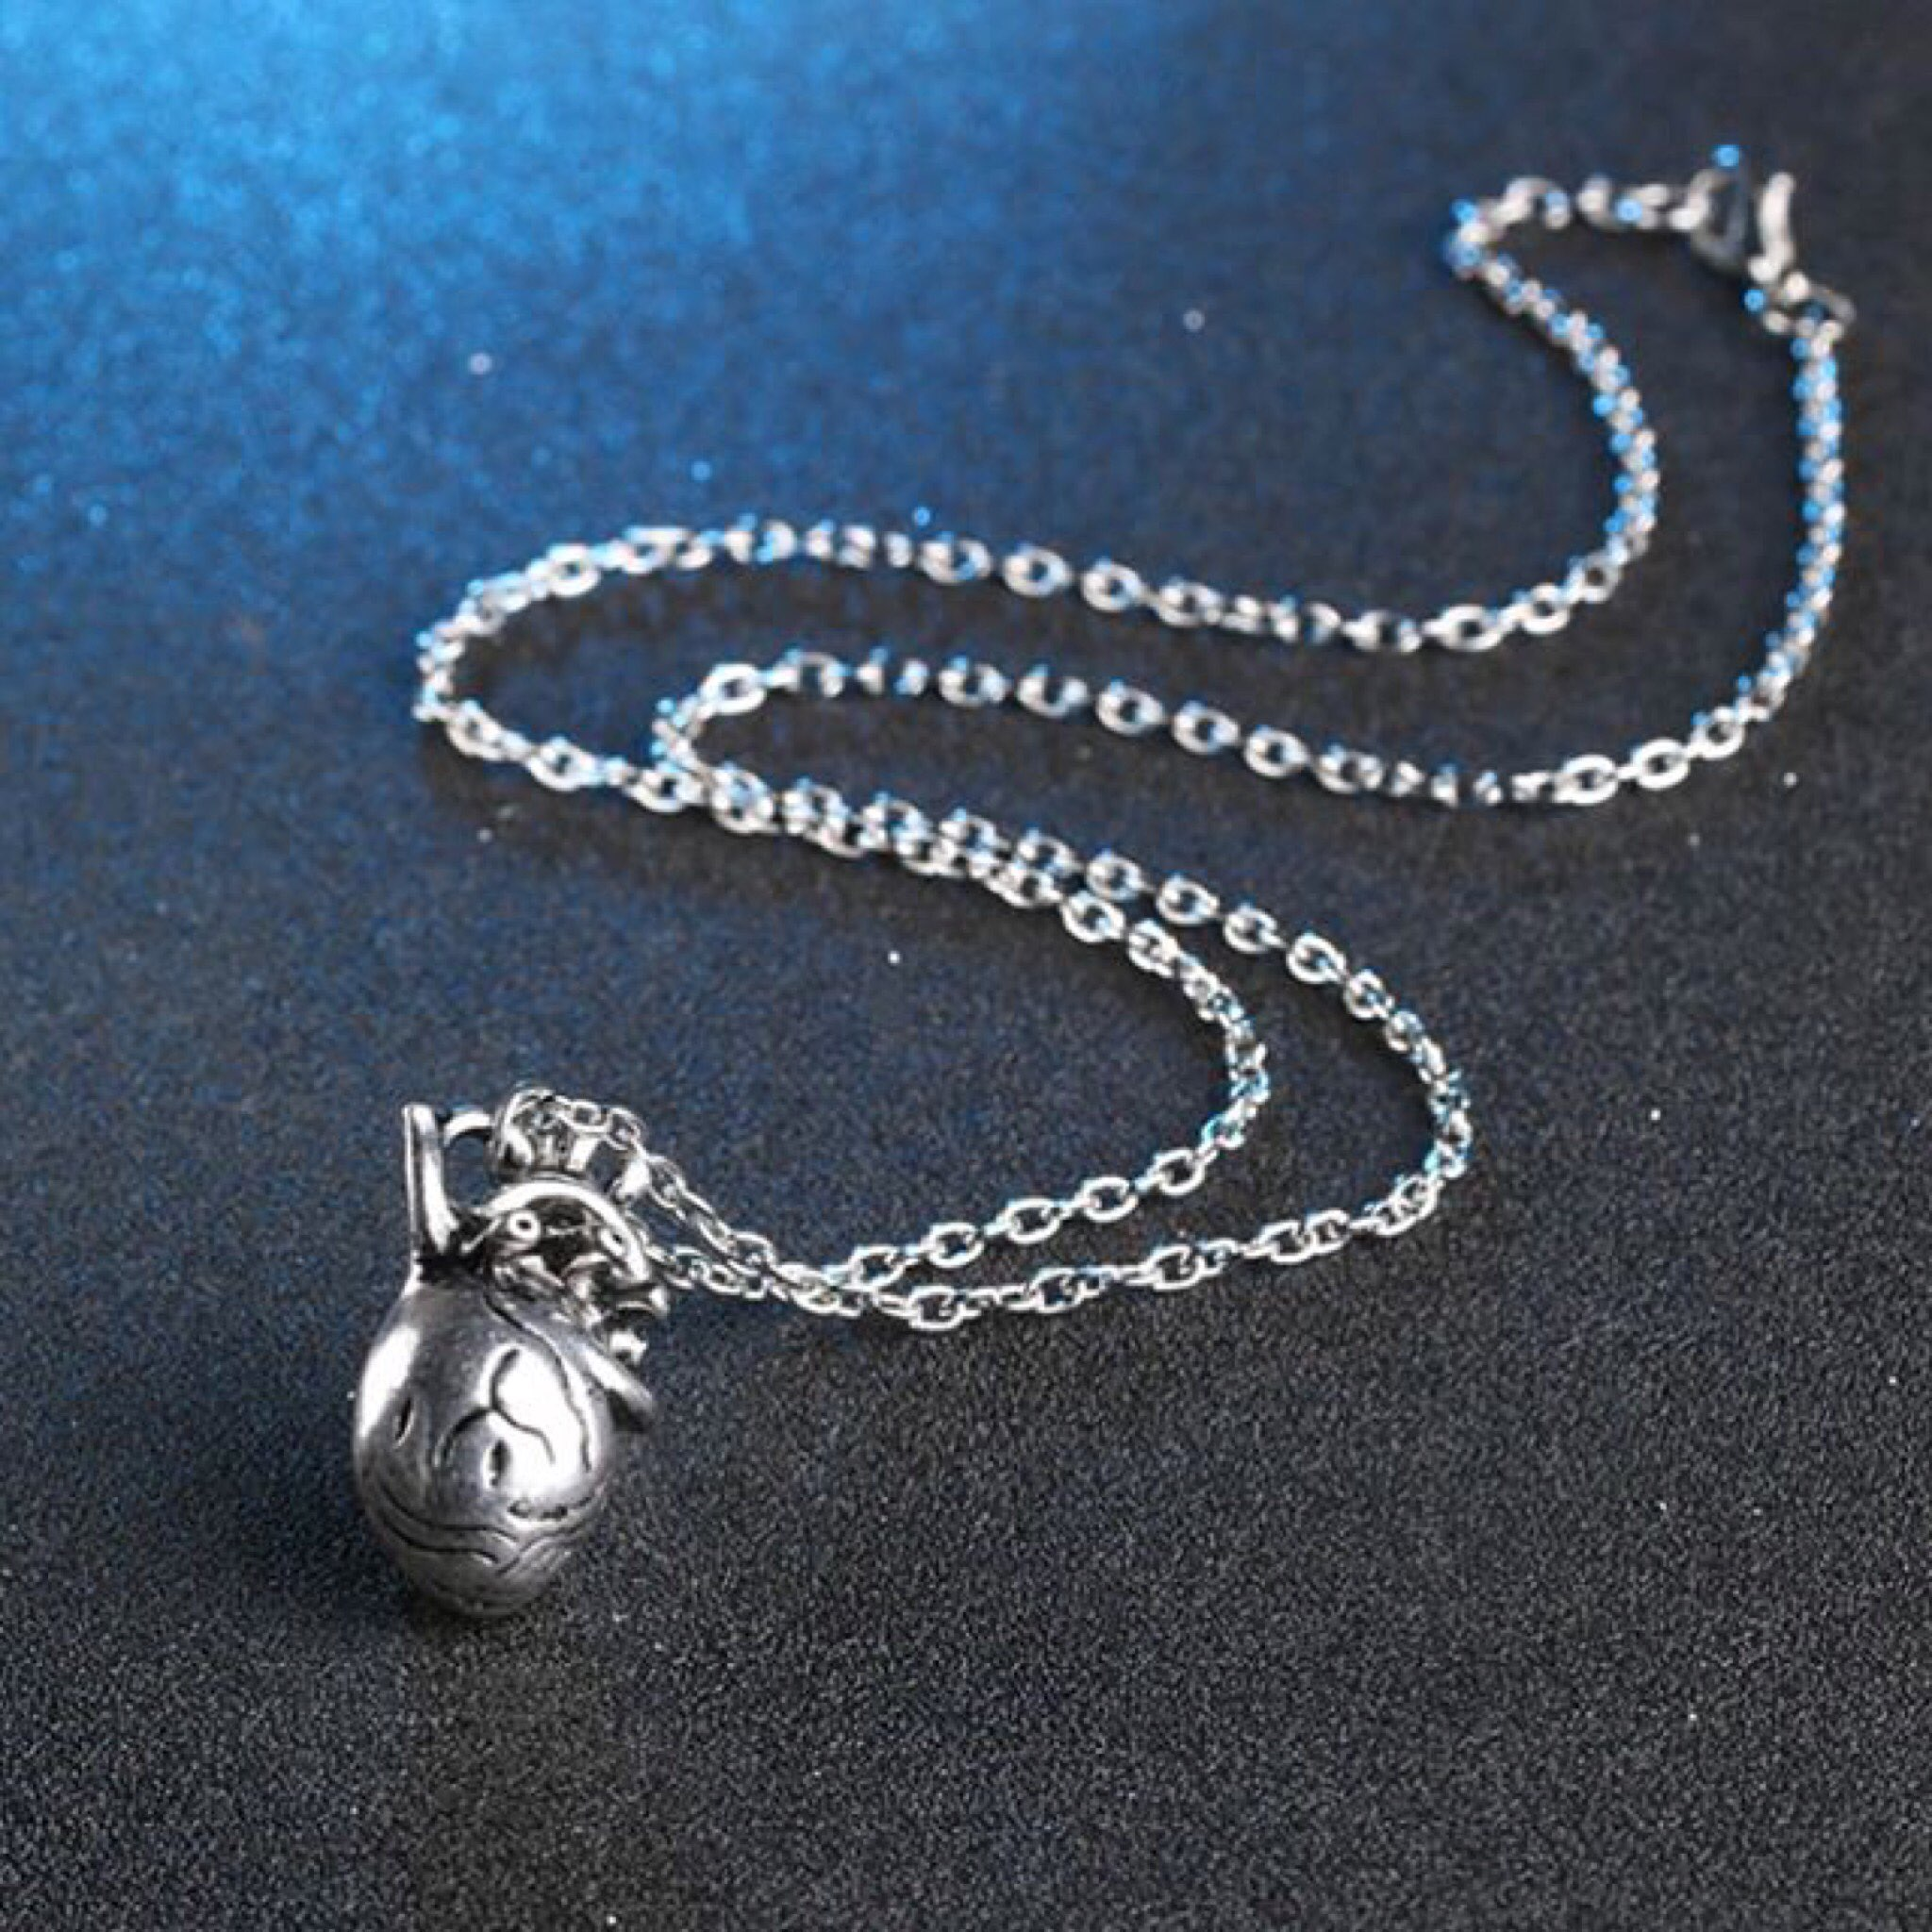 anatomy heart necklace - سلسال القلب | BLVCK WINGS